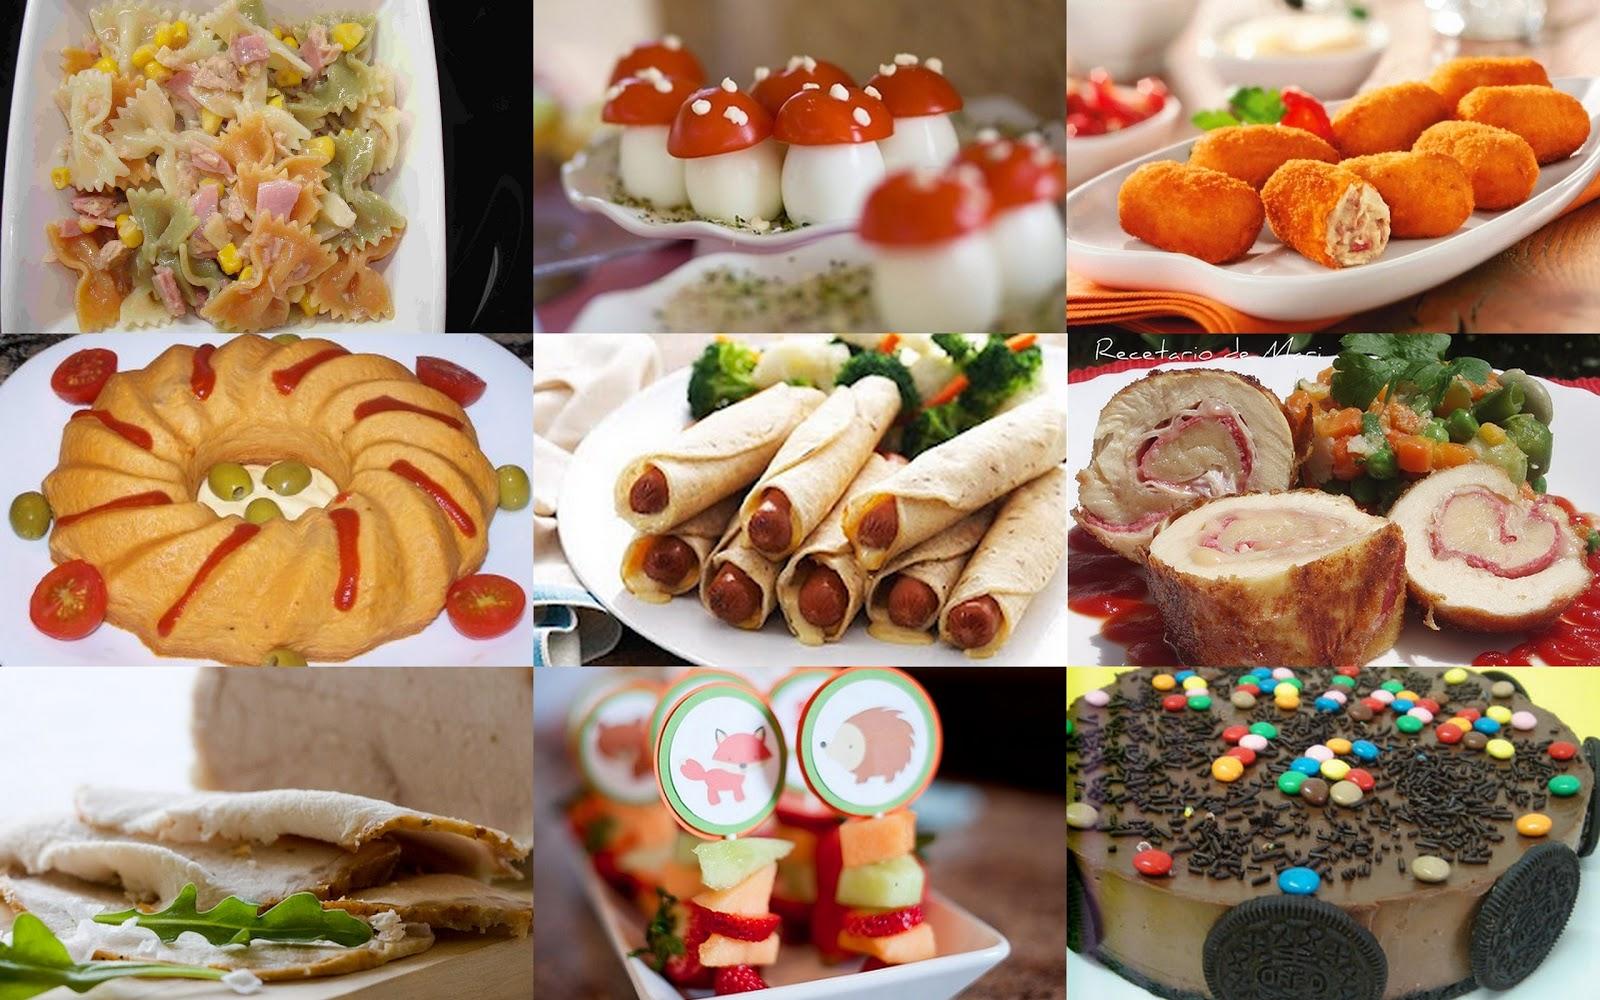 Fiestas con encanto buffet frio para ni os recetas - Fiesta de cumpleanos en casa para ninos ...